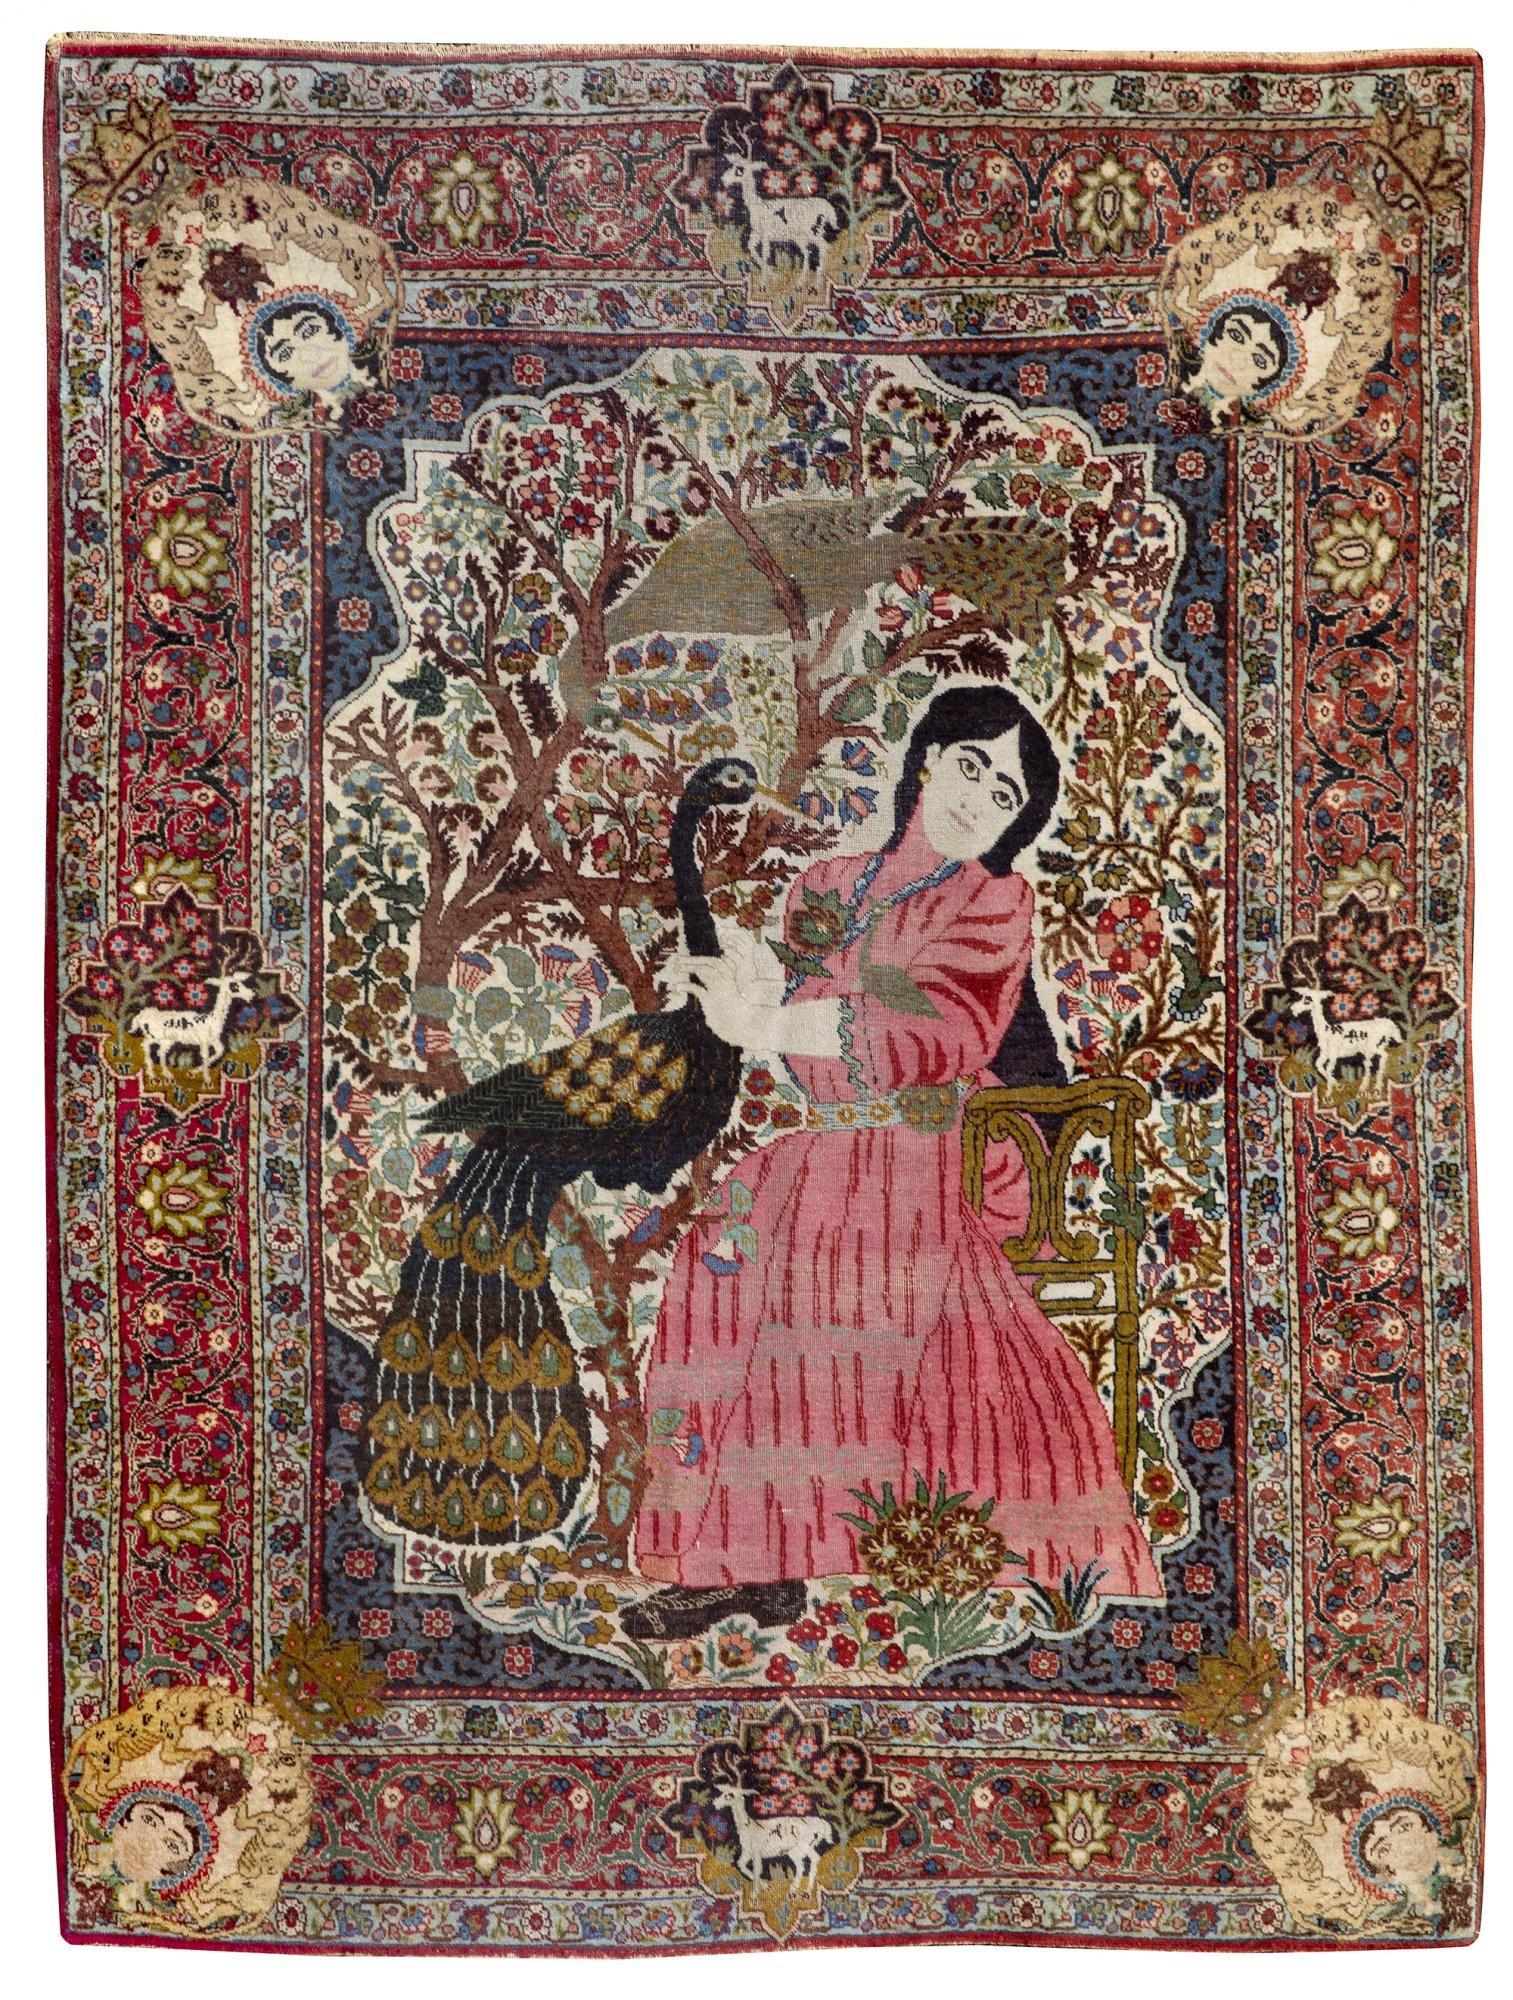 A PERSIAN TABRIZ RUG